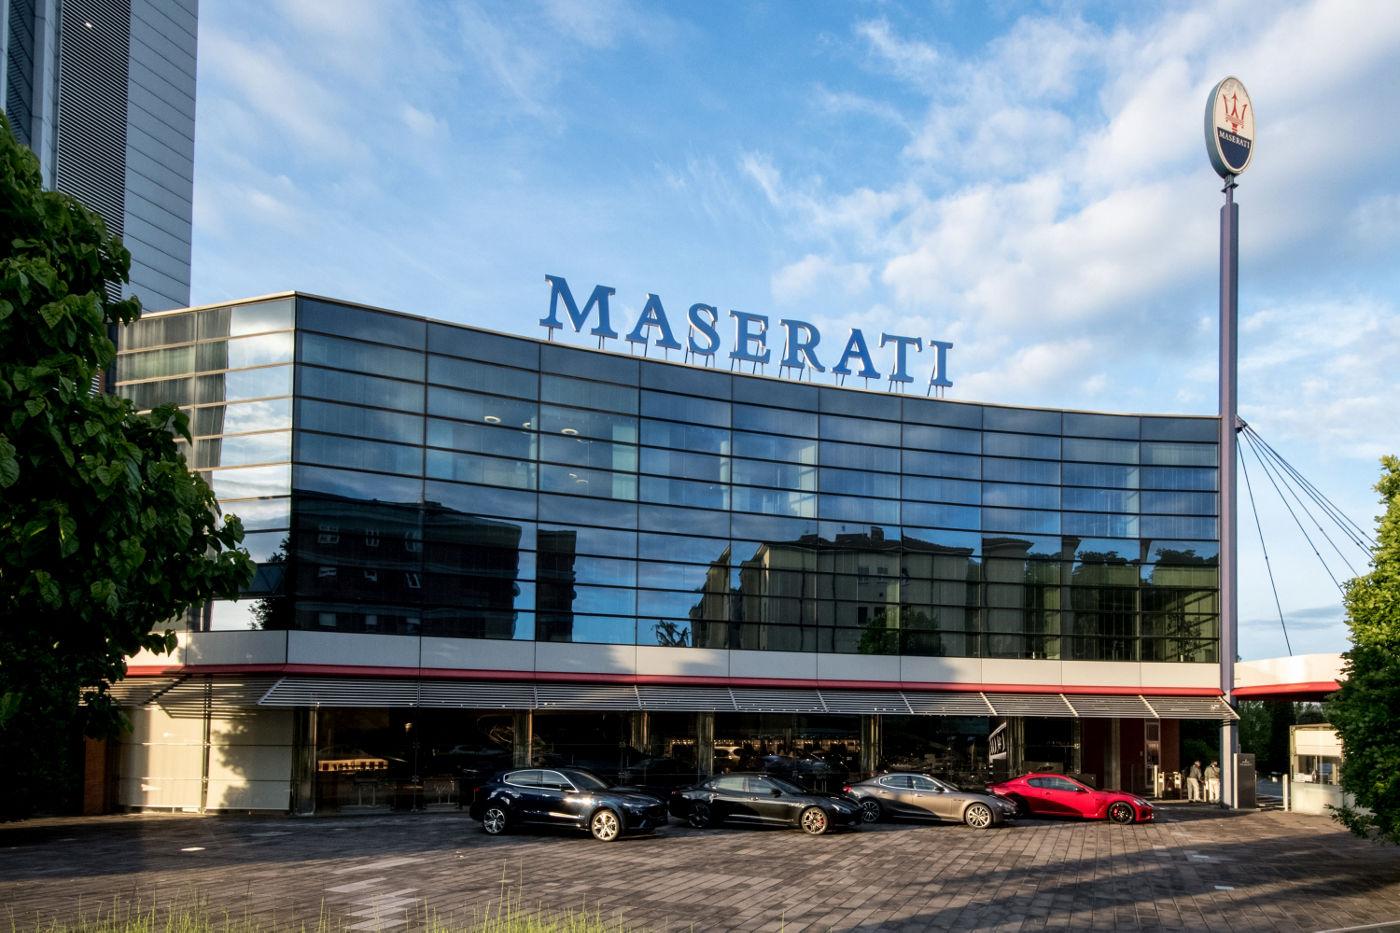 Maserati Headquarter in Modena